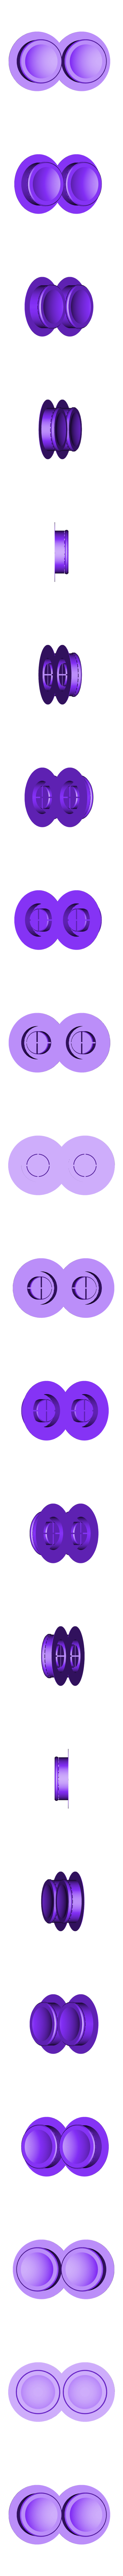 spinner_comfy_cap_2x629.stl Download free STL file Handwheel Spinner • Object to 3D print, bda